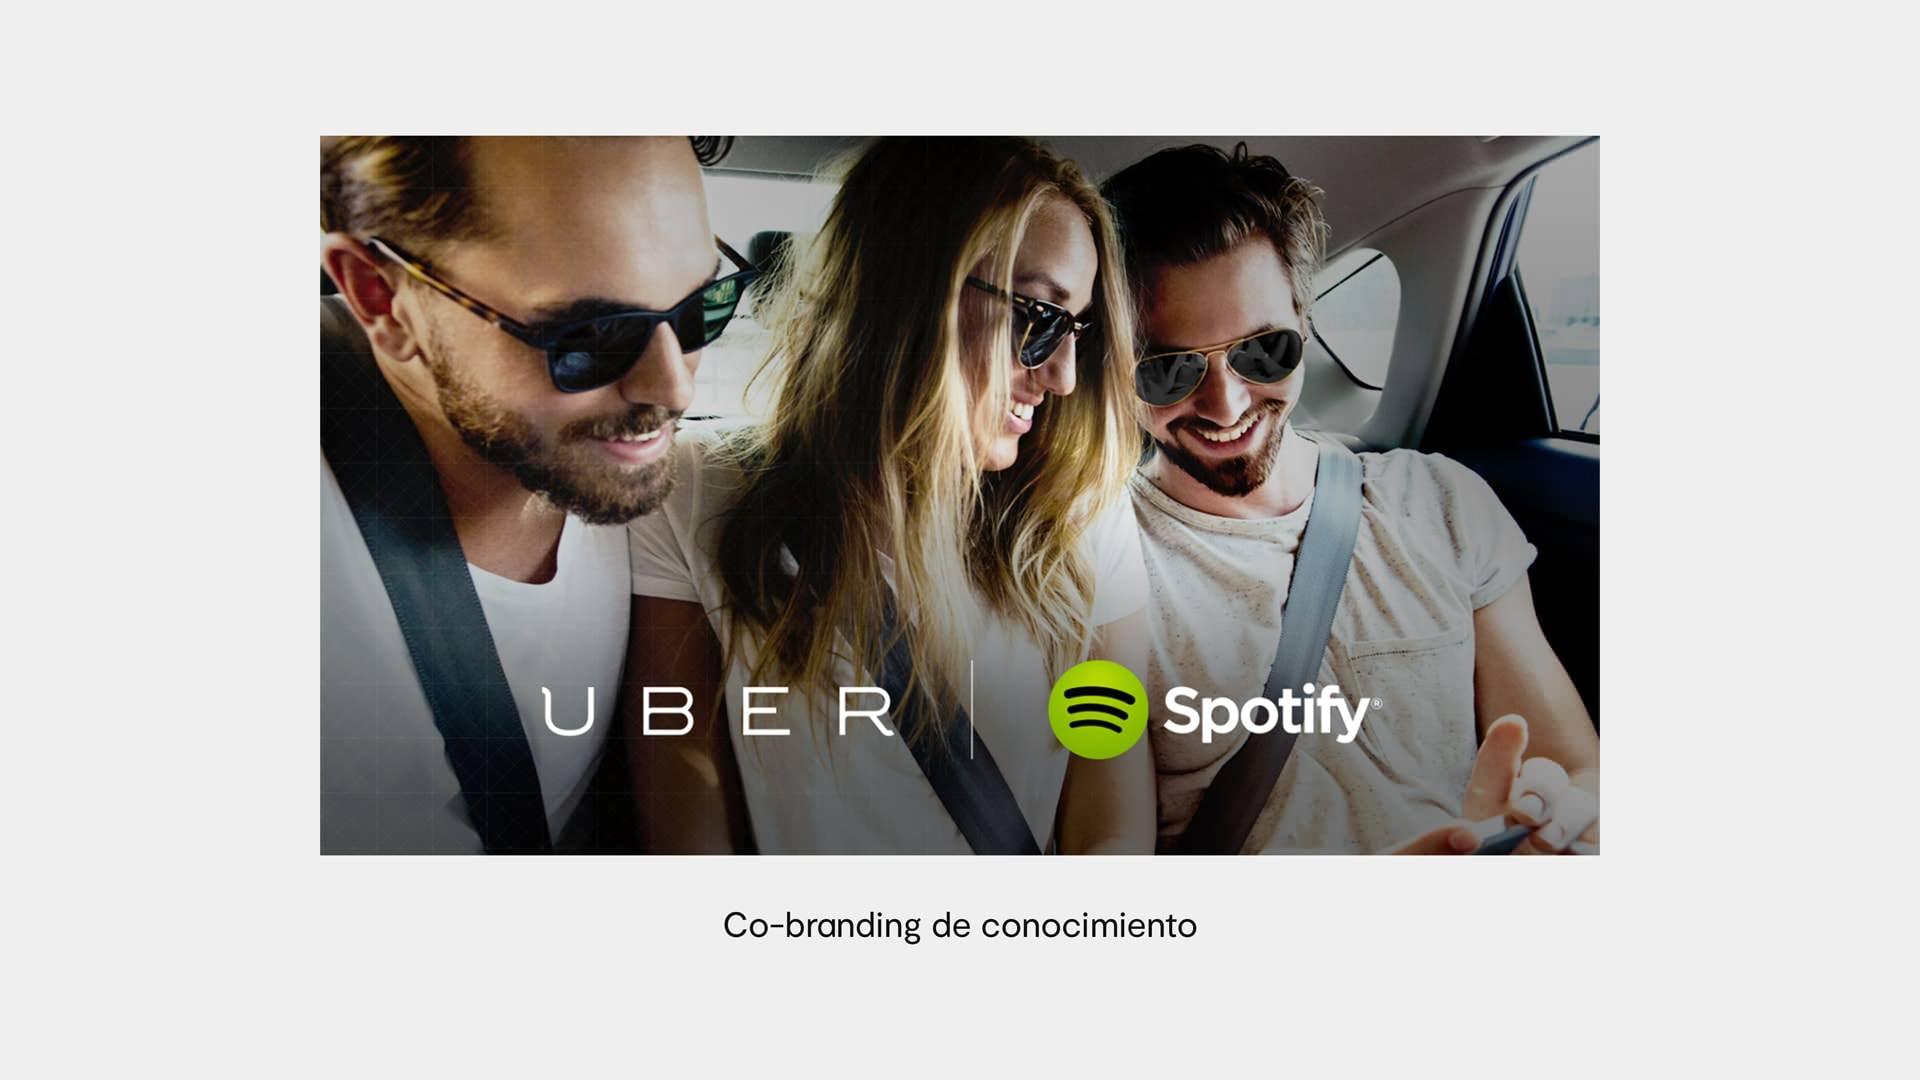 ejemplo cobranding uber y spotify